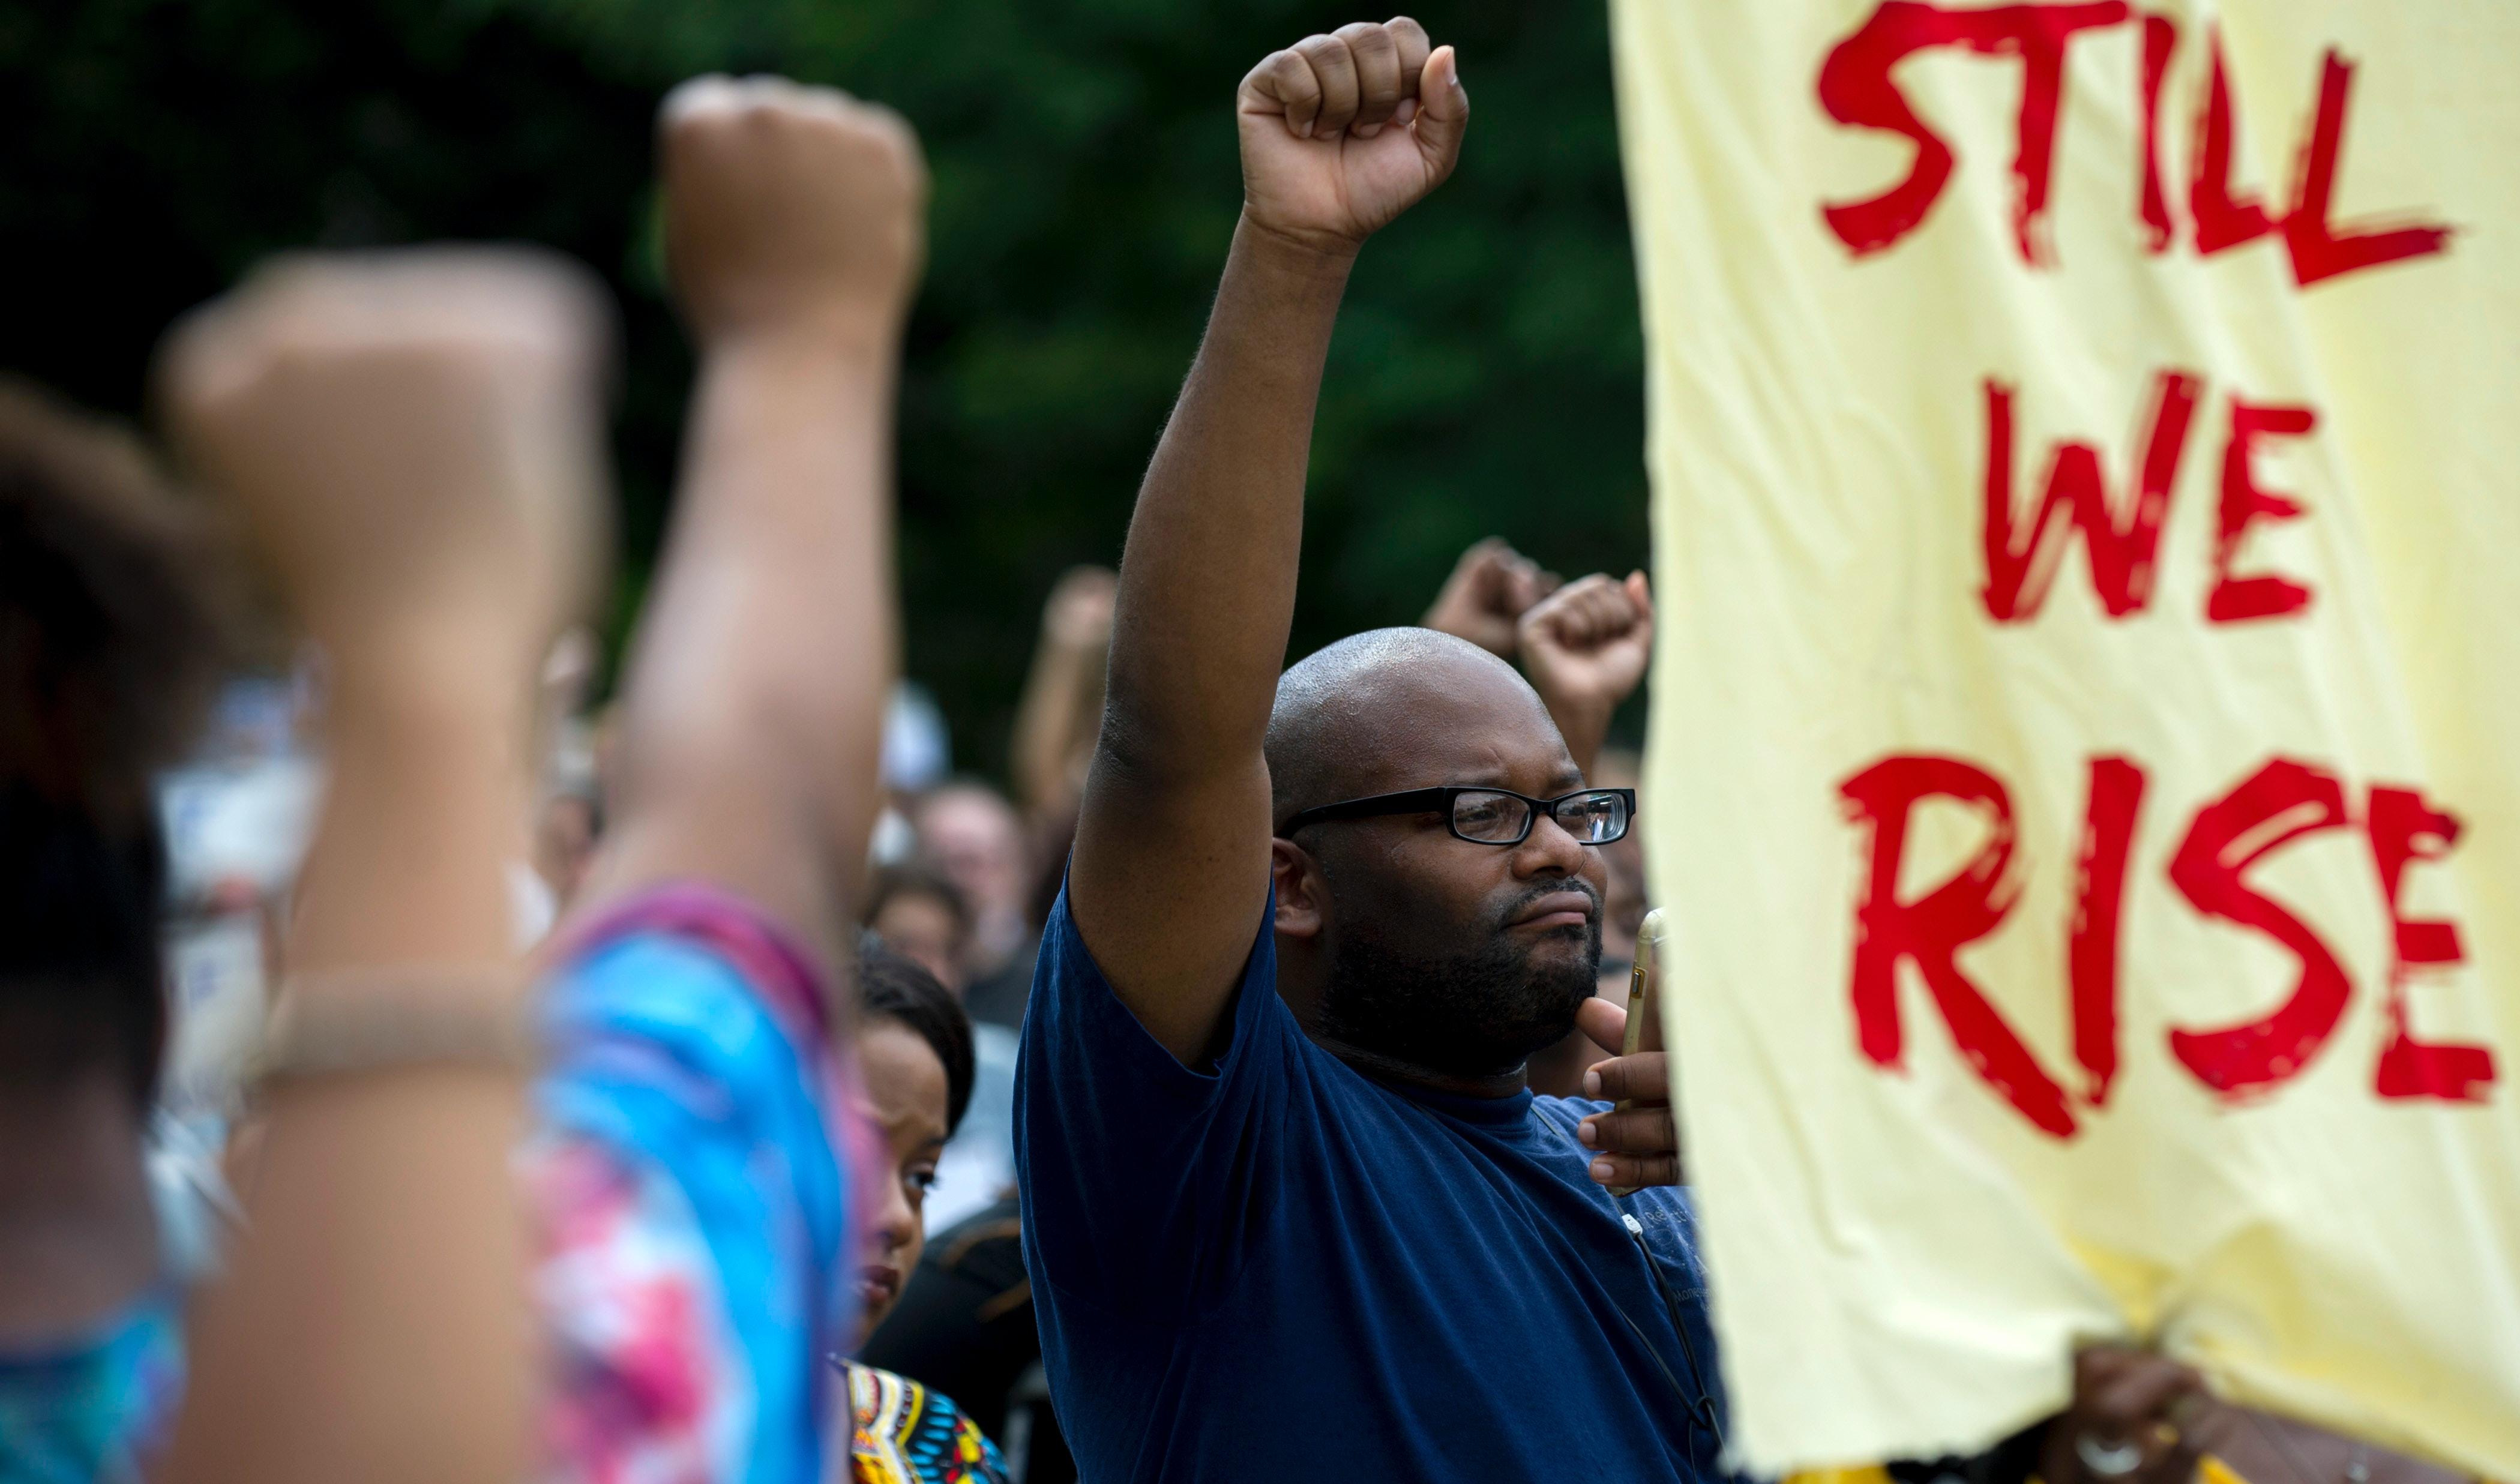 Mark Ruffalo is marching through Virginia